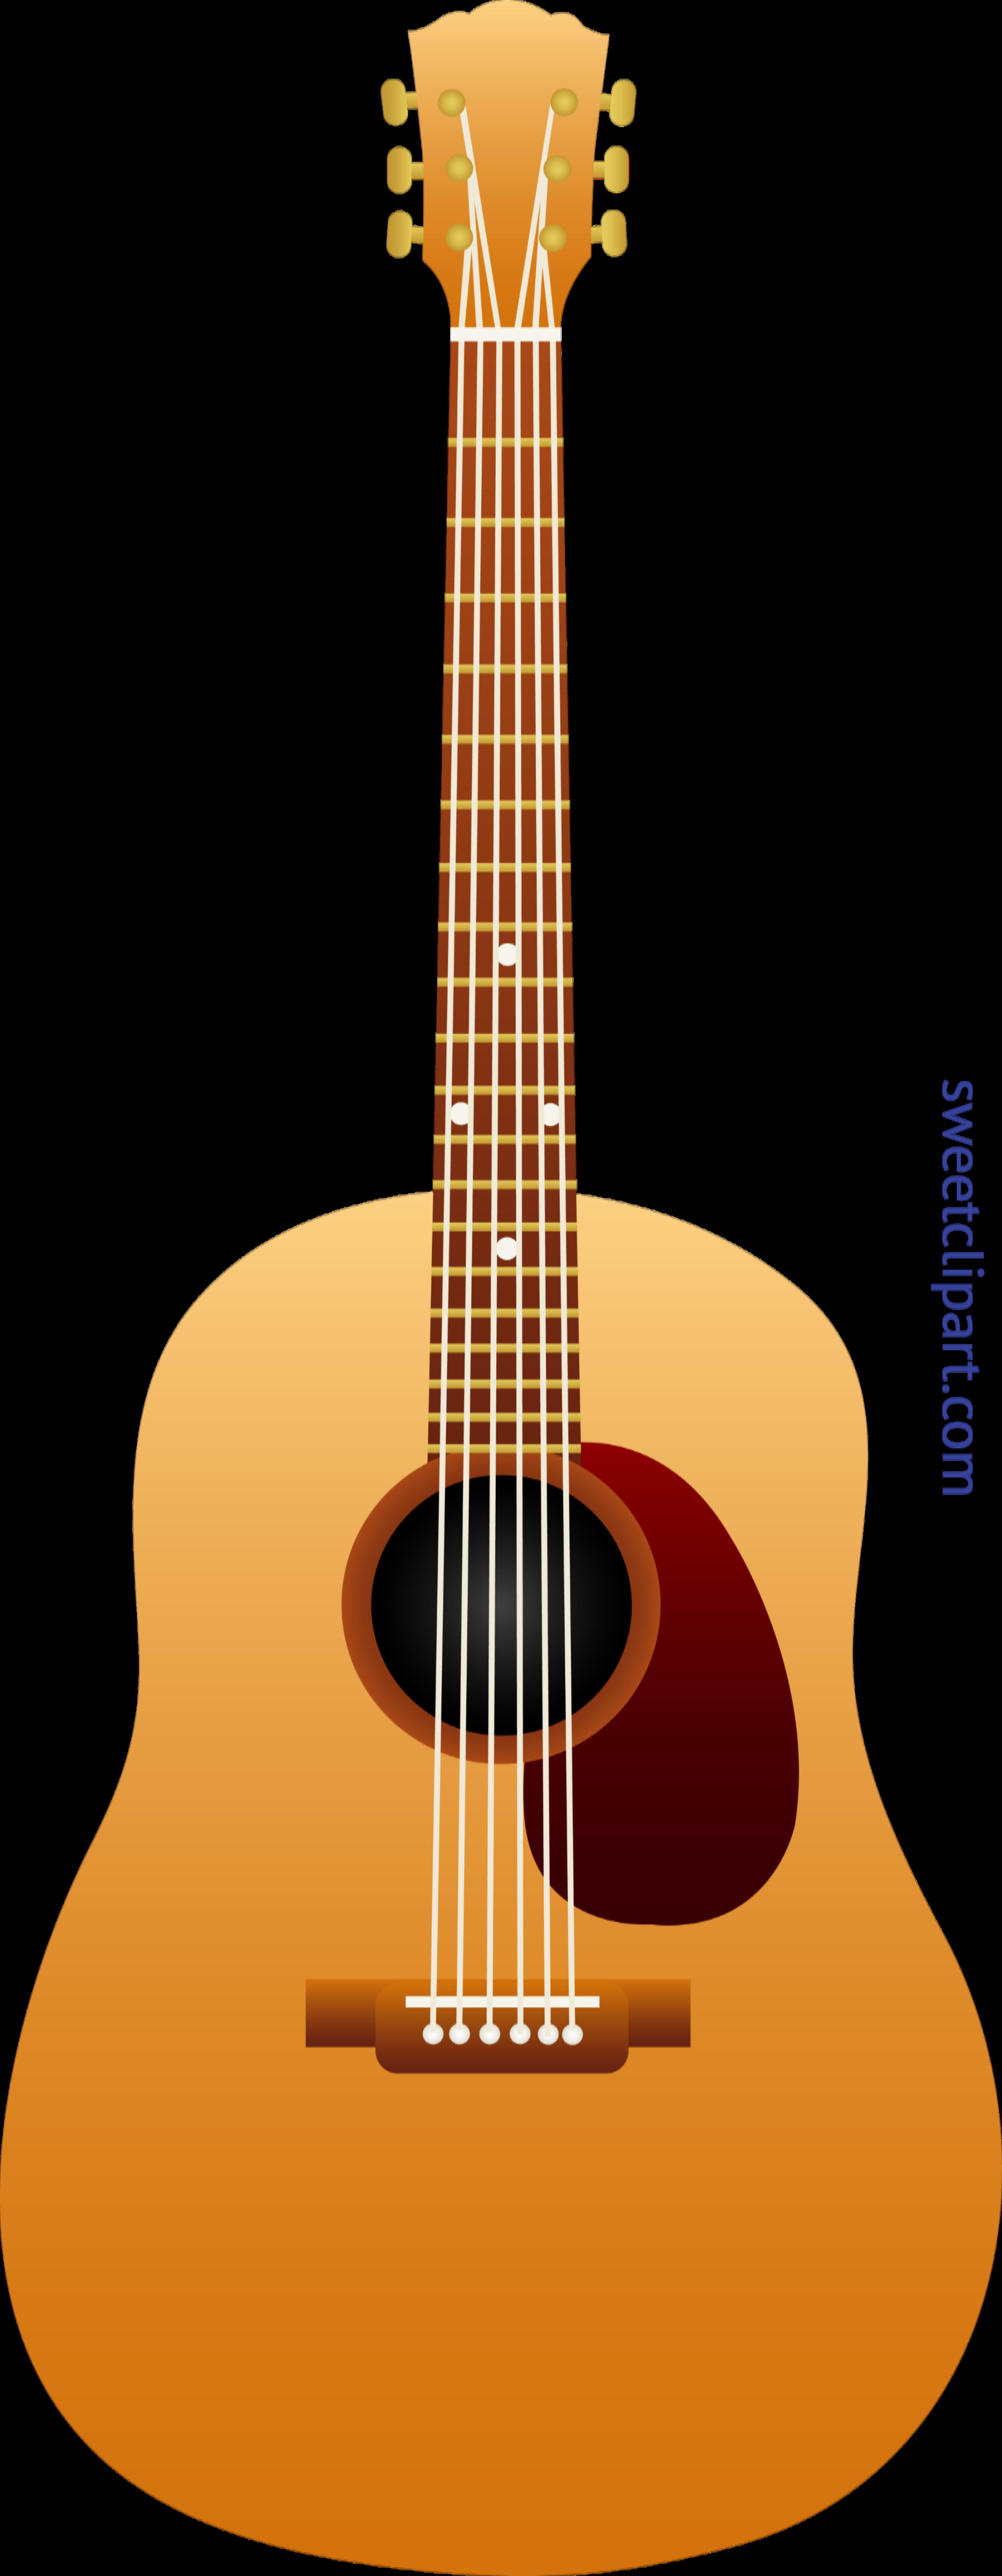 png transparent stock Classical wooden guitar clip. Acoustic clipart guitarist